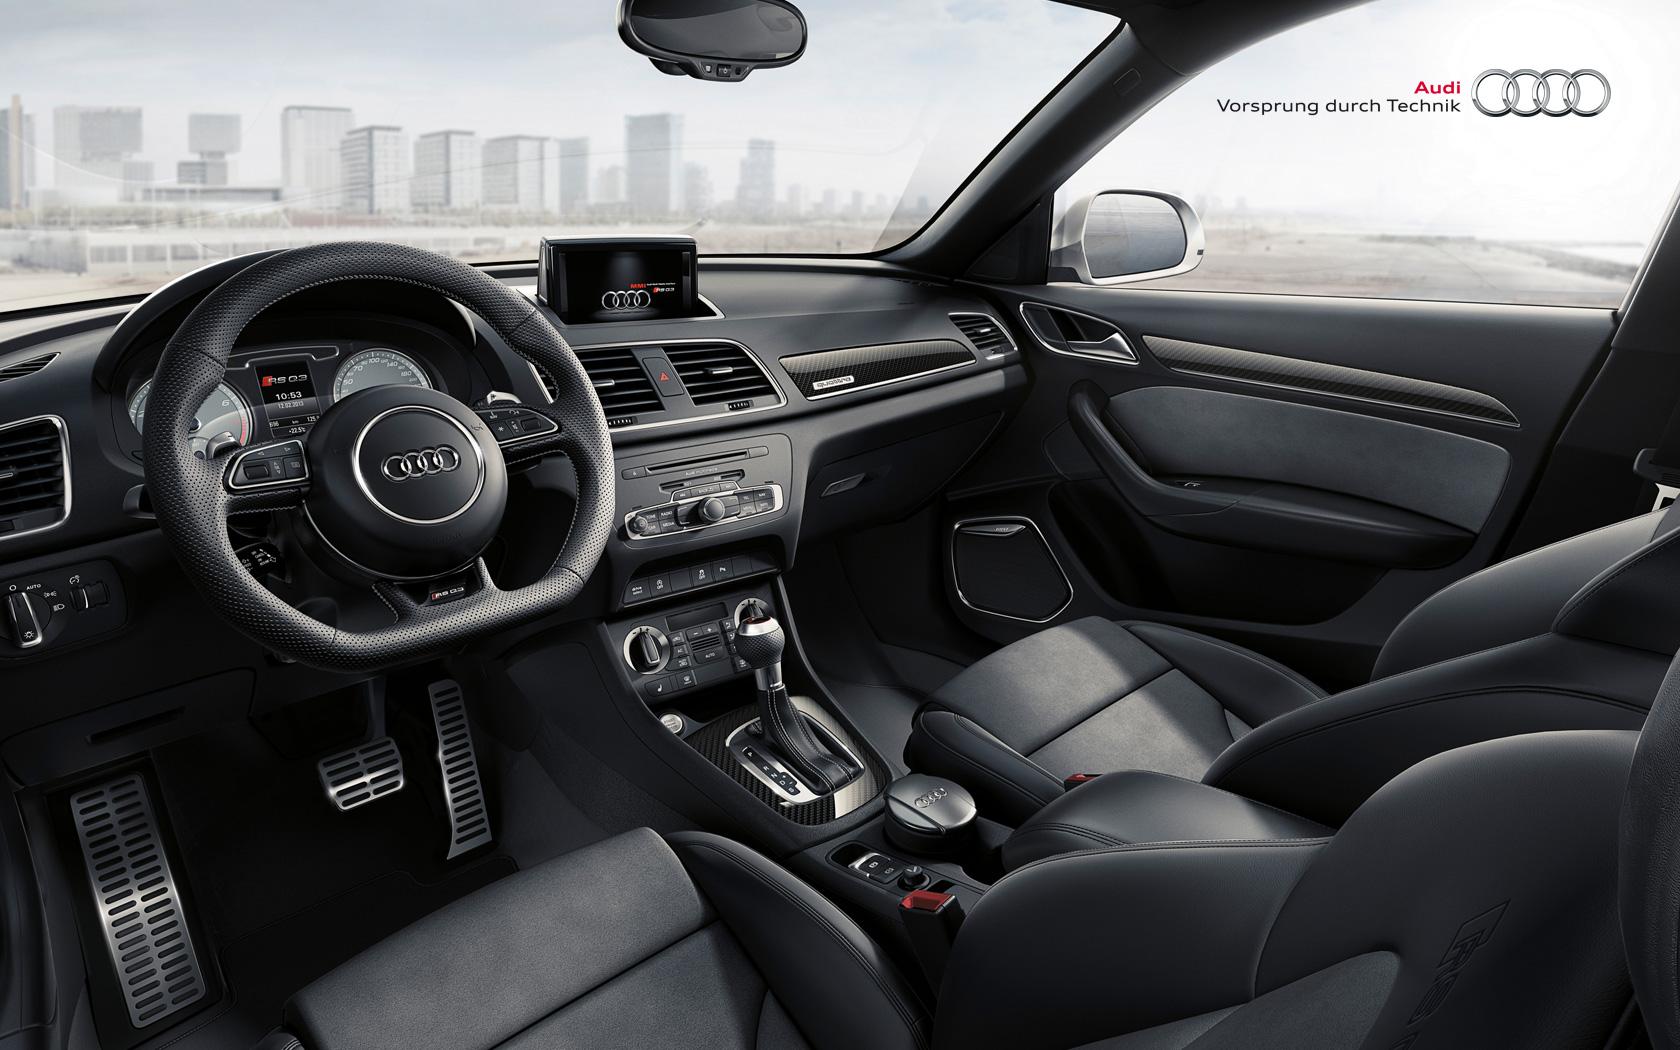 AUDI RS Q3 2013 2014 2015 Autoevolution